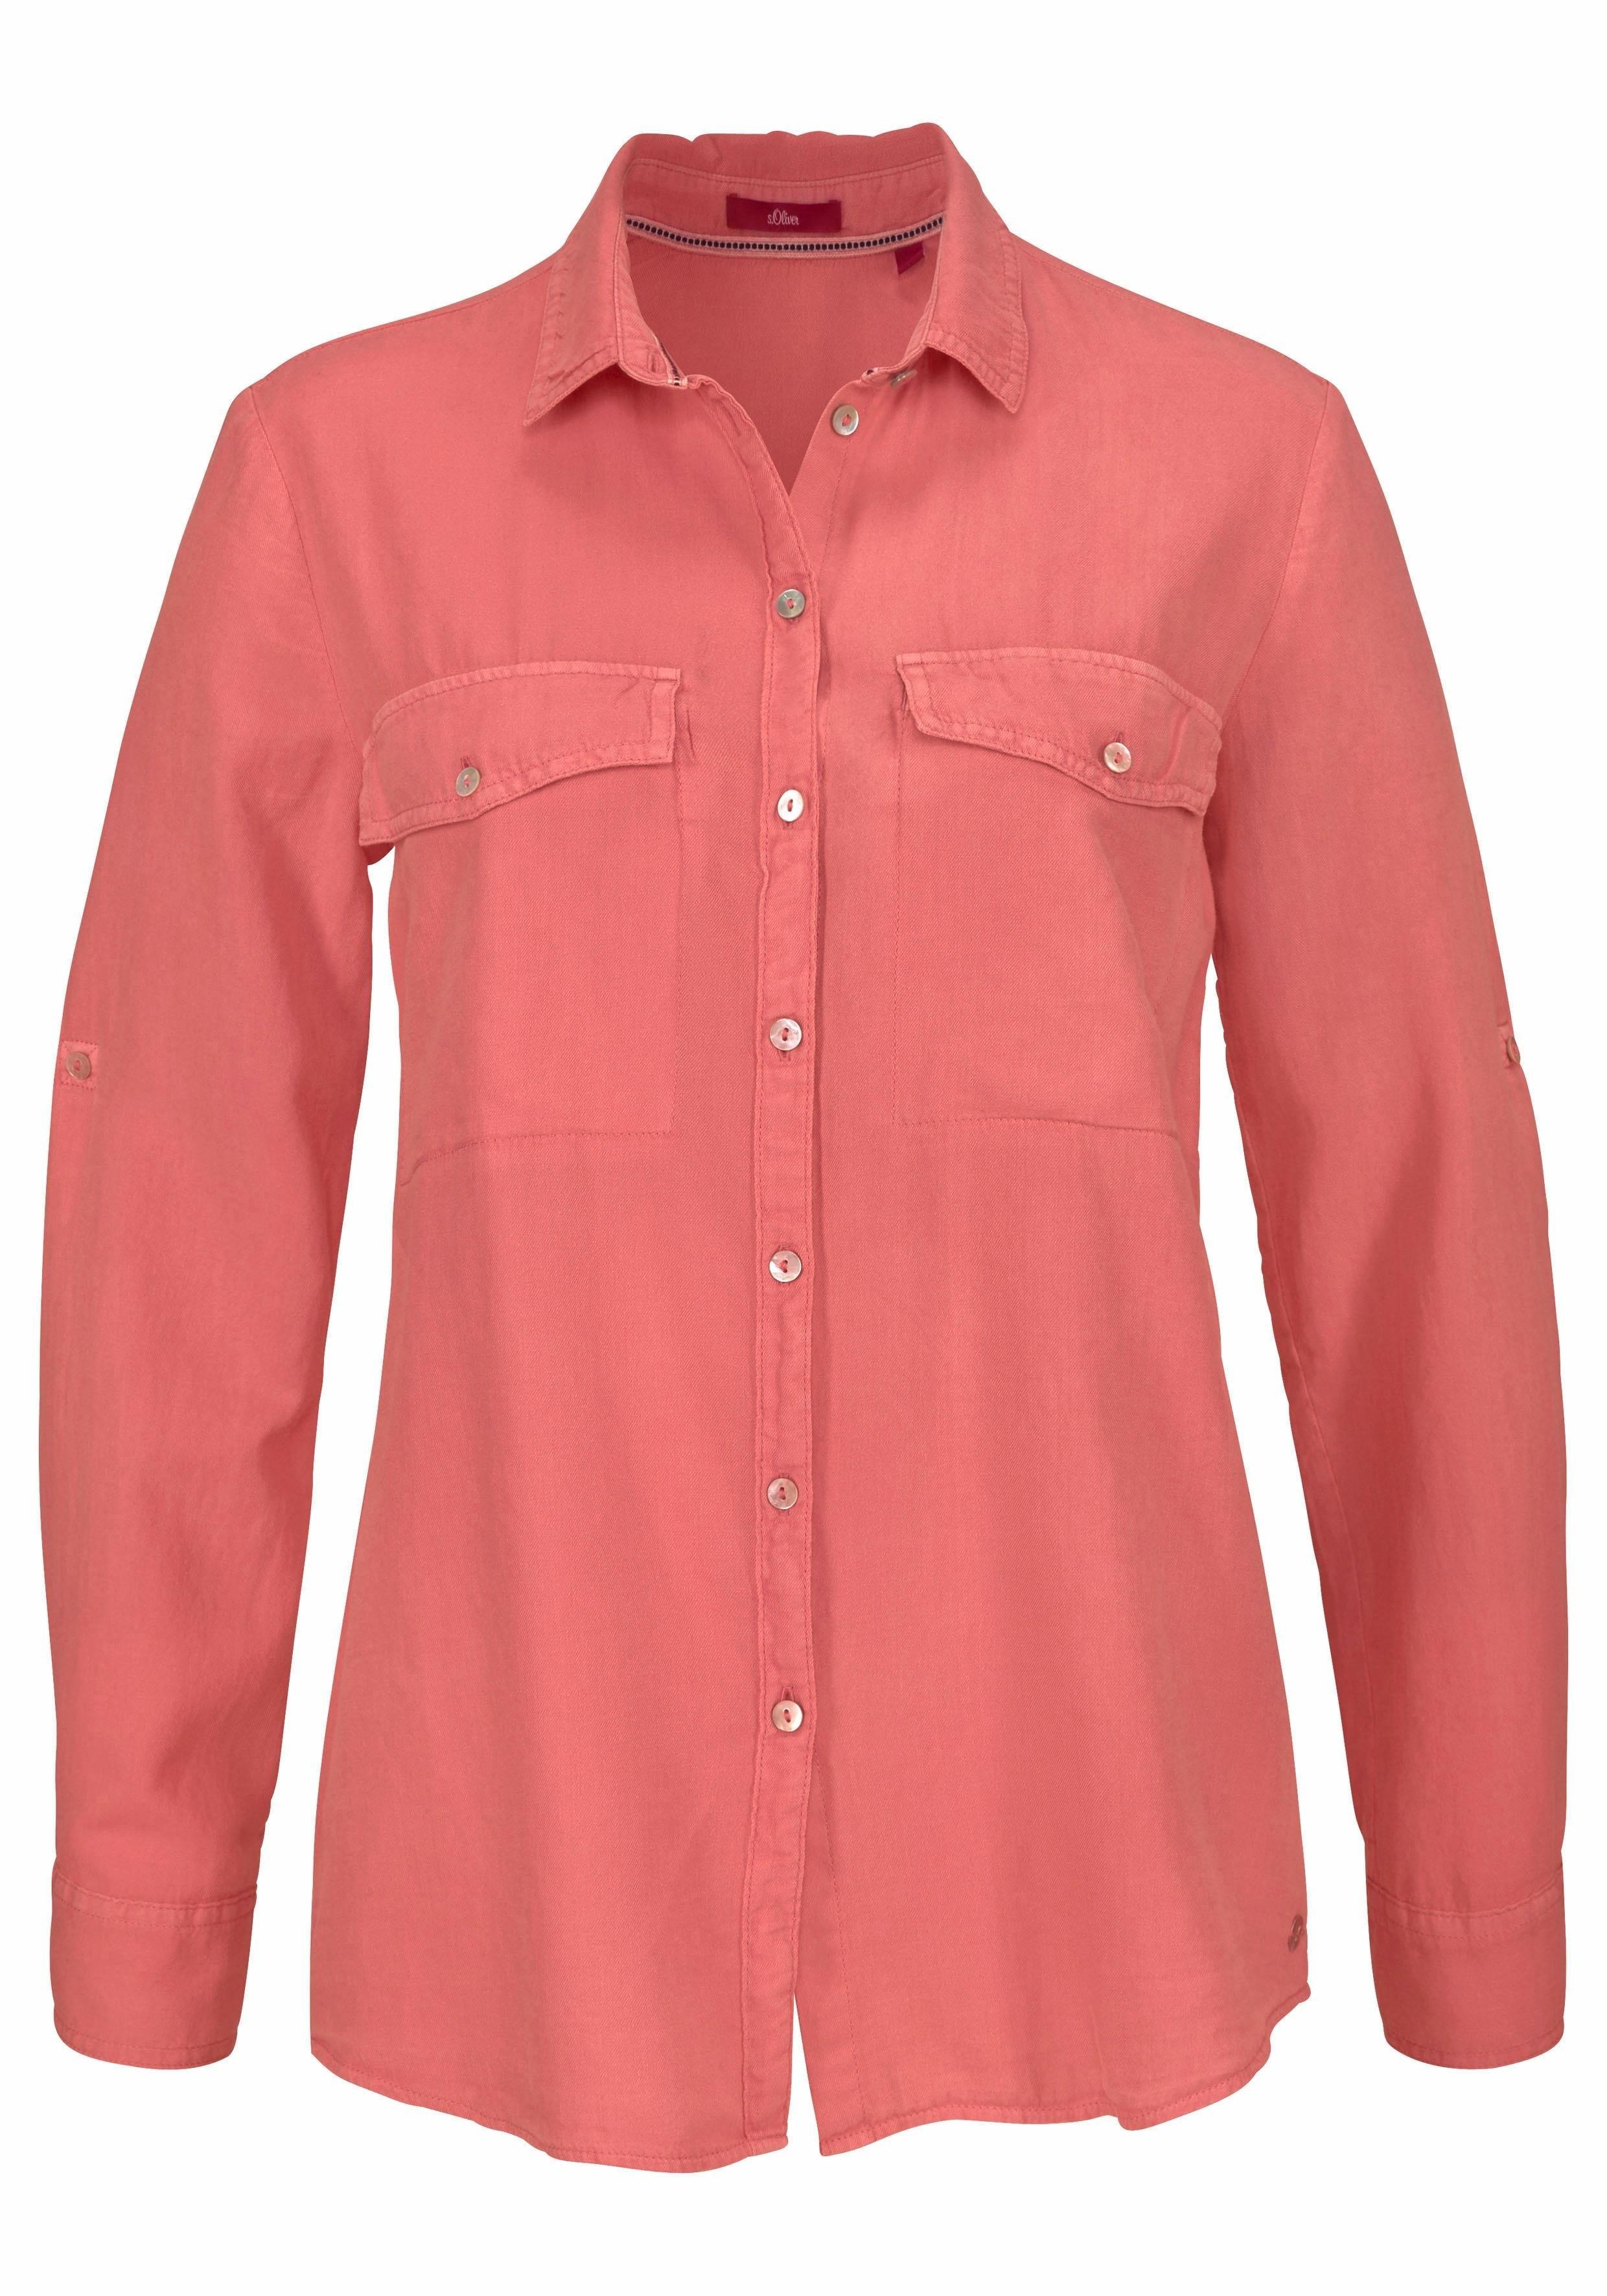 oliver Label Gekocht Red Overhemdblouse S Makkelijk PkOXZiu